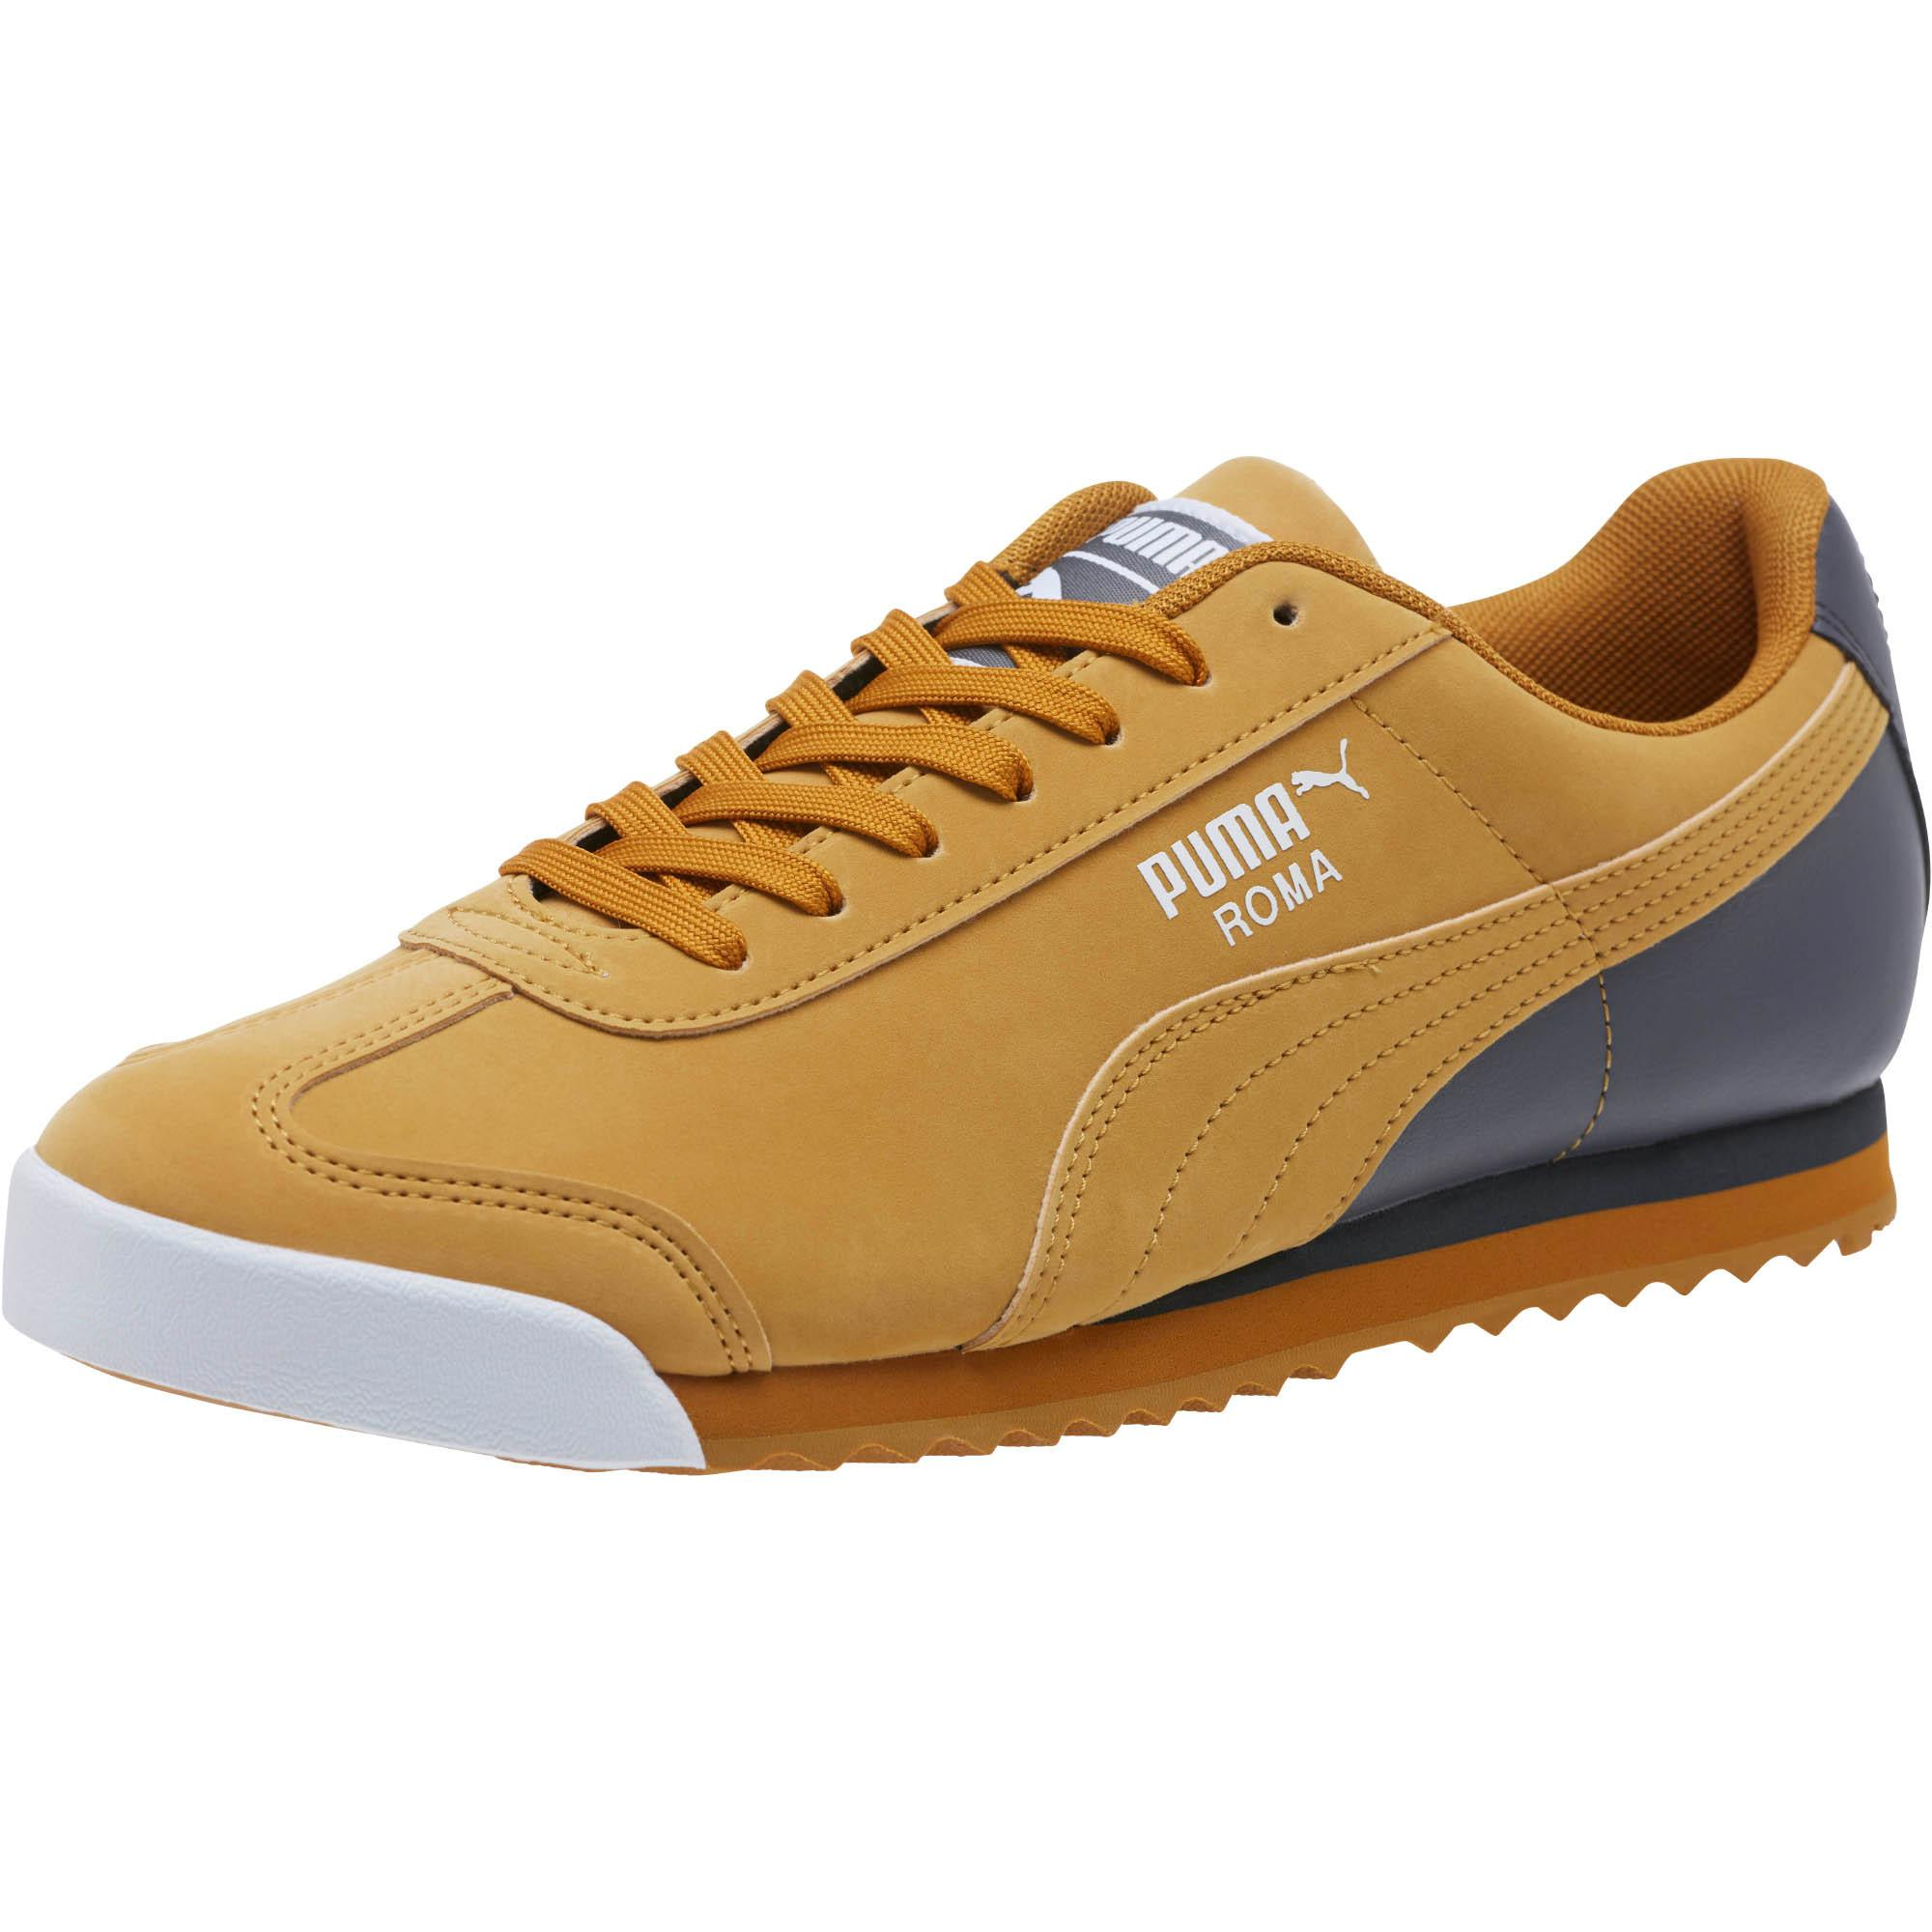 Lyst - PUMA Roma Retro Sports Men s Sneakers in Brown for Men 2b425b891